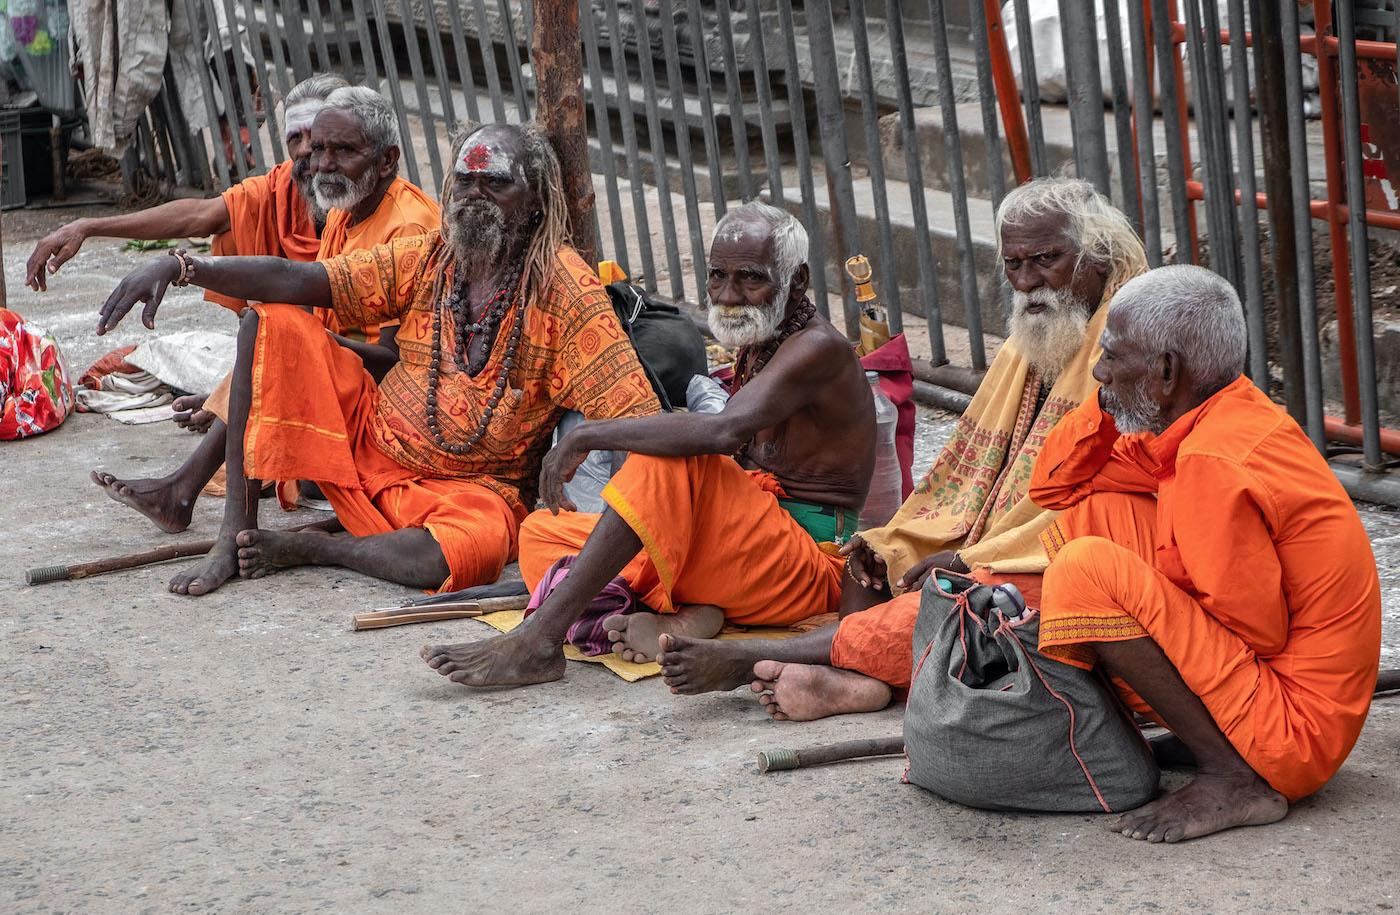 Rondreis zuid india tips